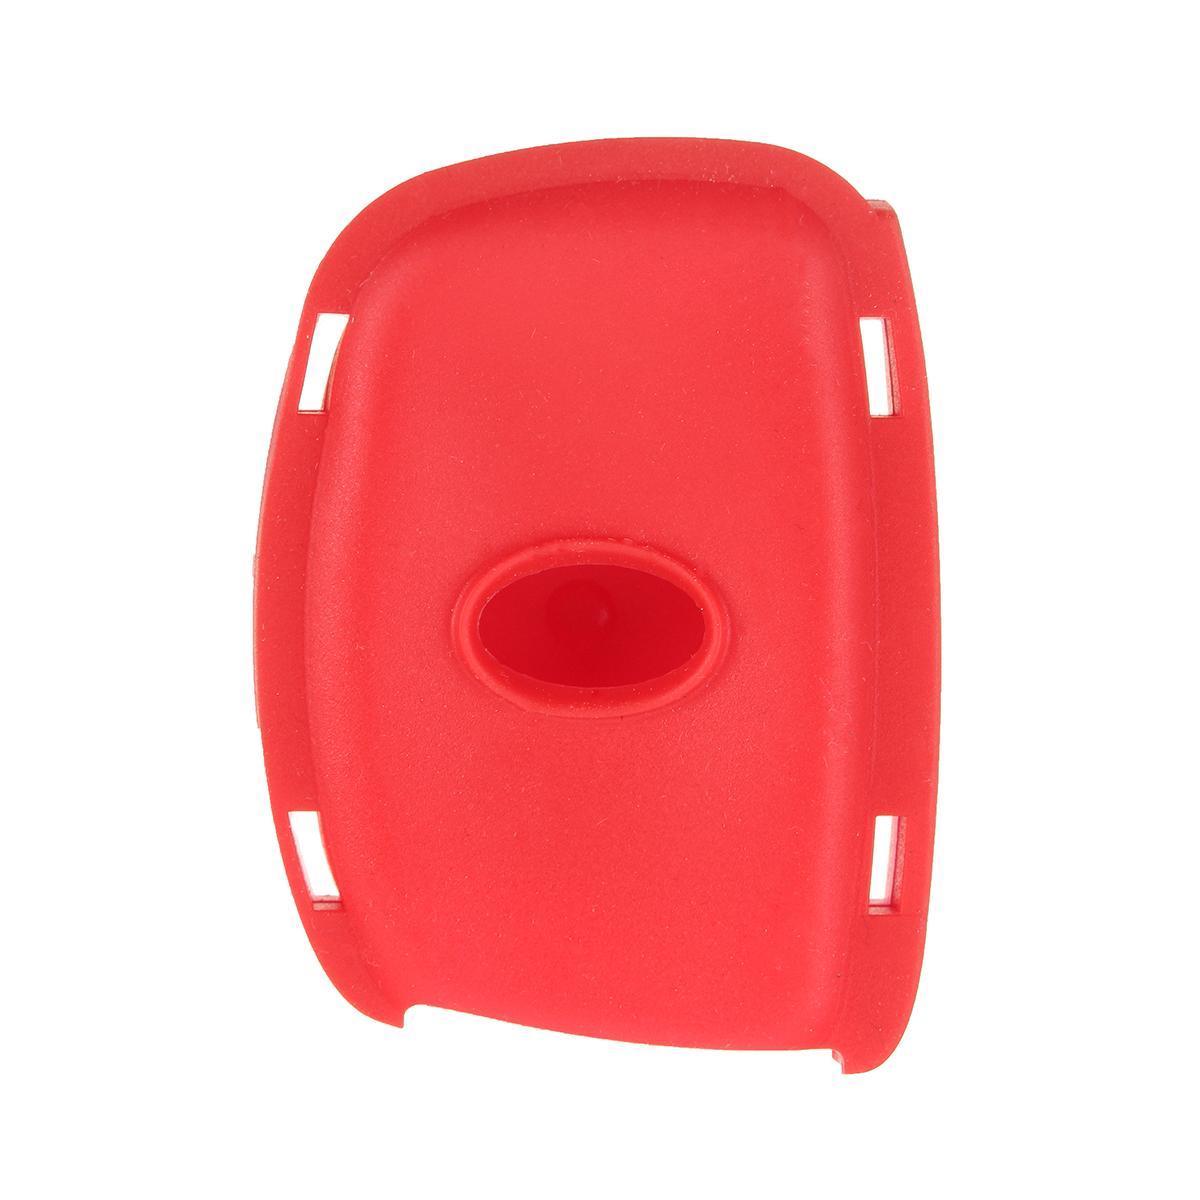 3 Buttons Silicone Key Fob Cover Case For Hyundai i30 IX35 Elantra Verna  Tucson #RED